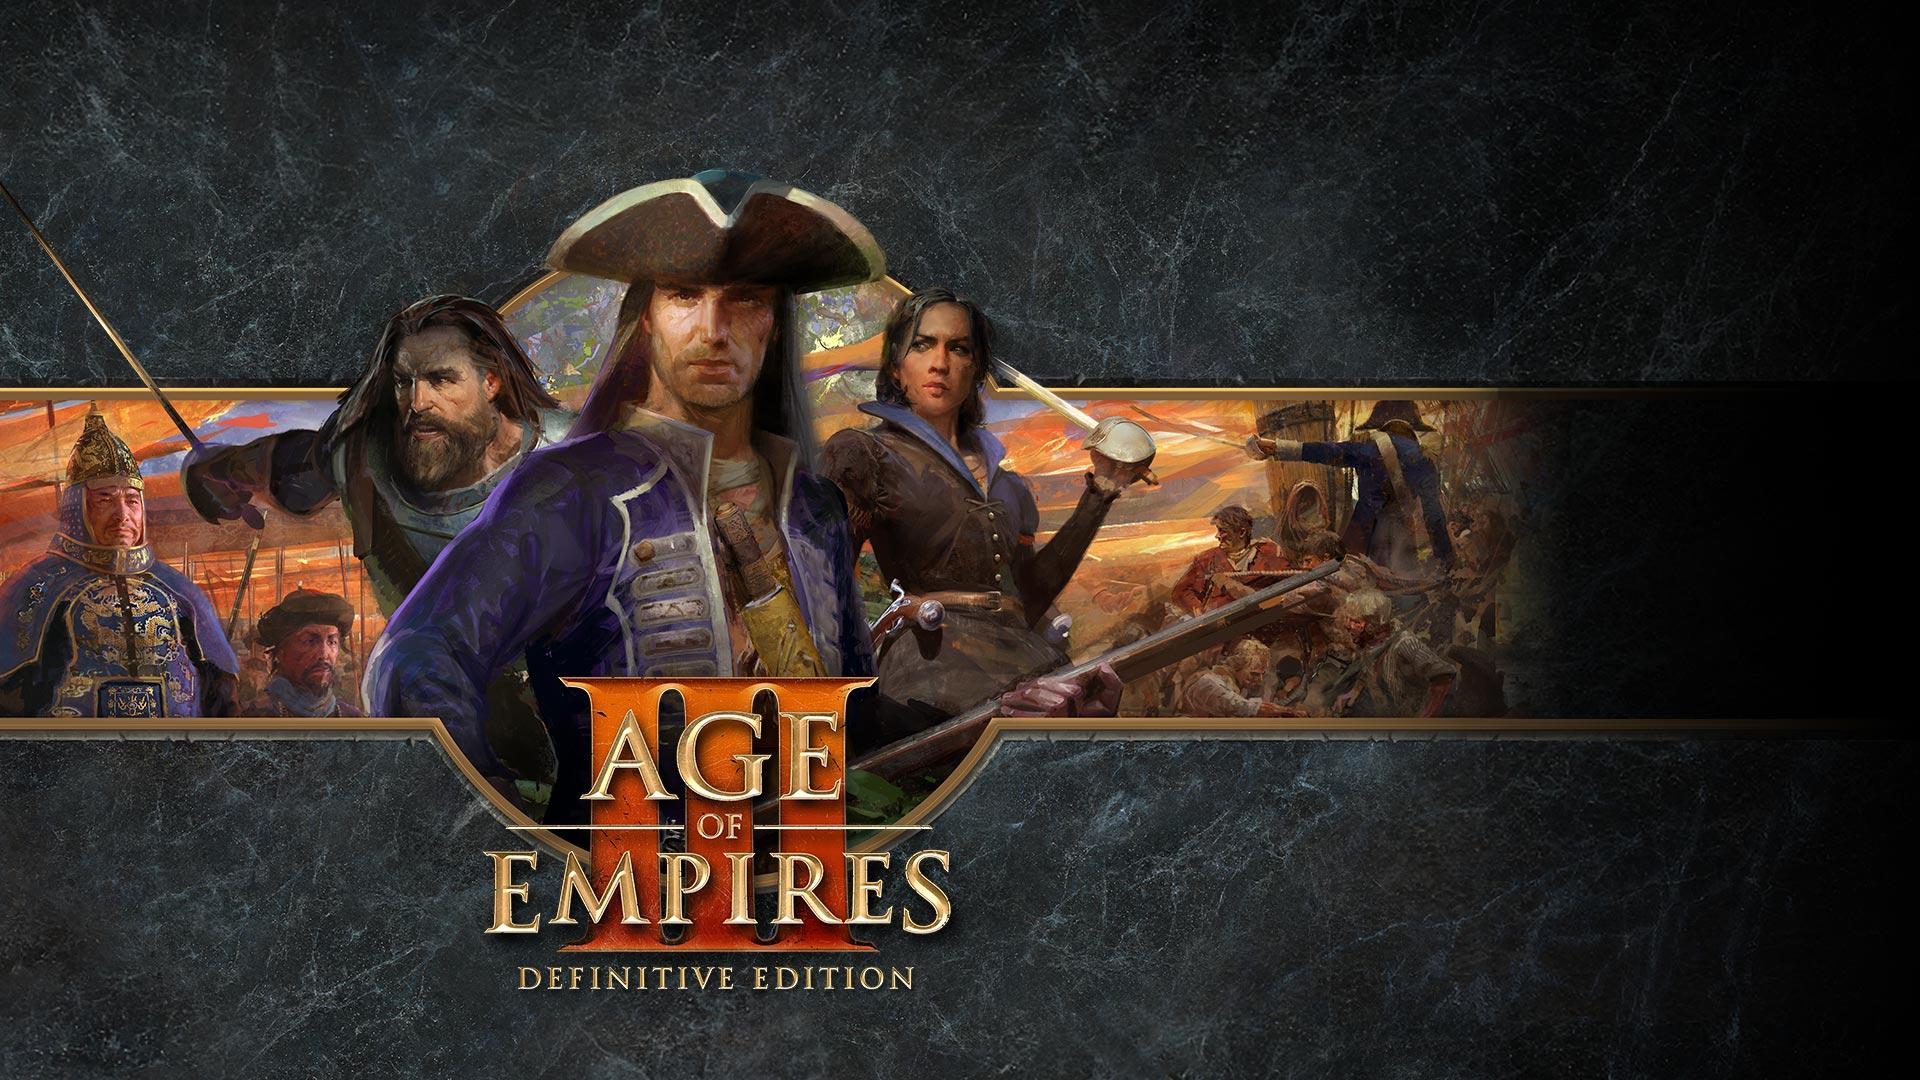 age of empires iii defitinive edition | Tekno Deha